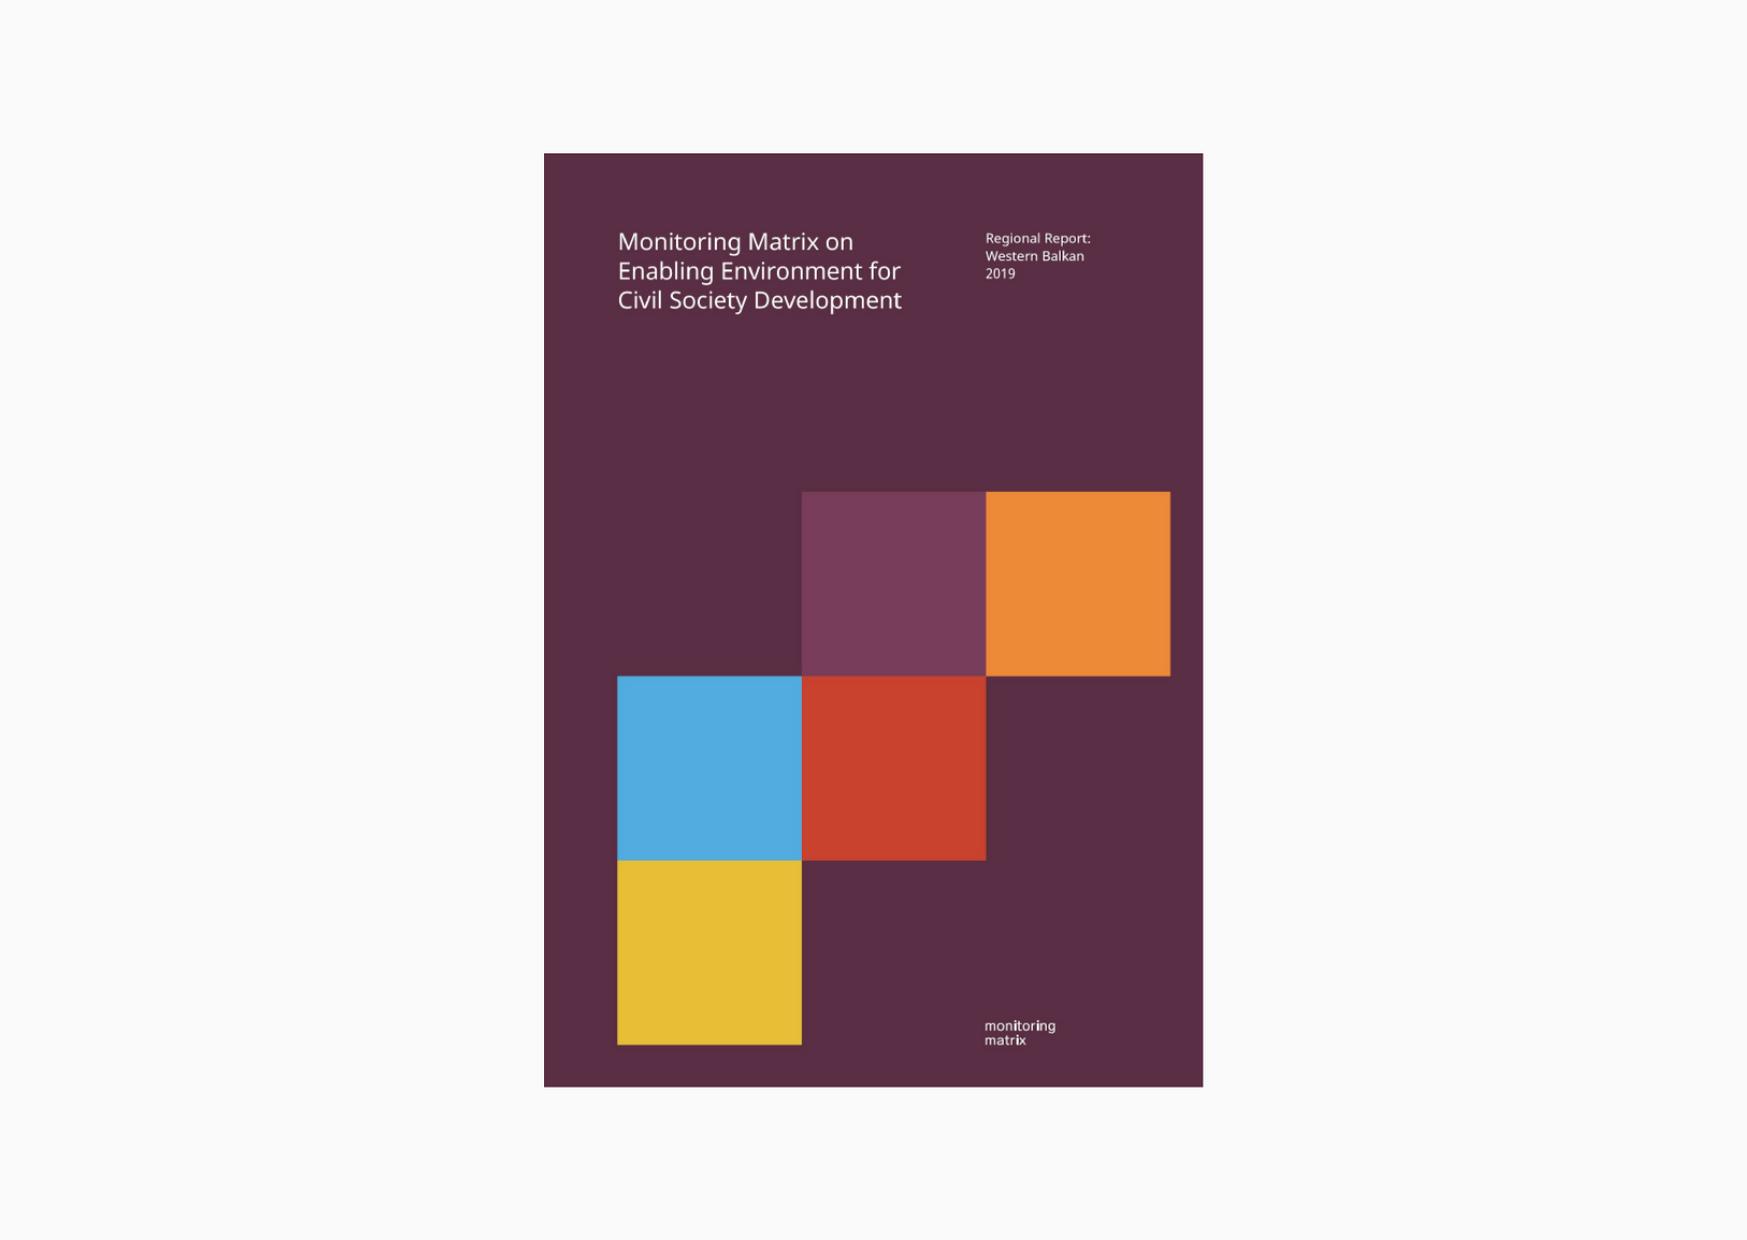 STUDY: Monitoring Matrix on Enabling Environment for Civil Society Developmen in the Western Balkan countries